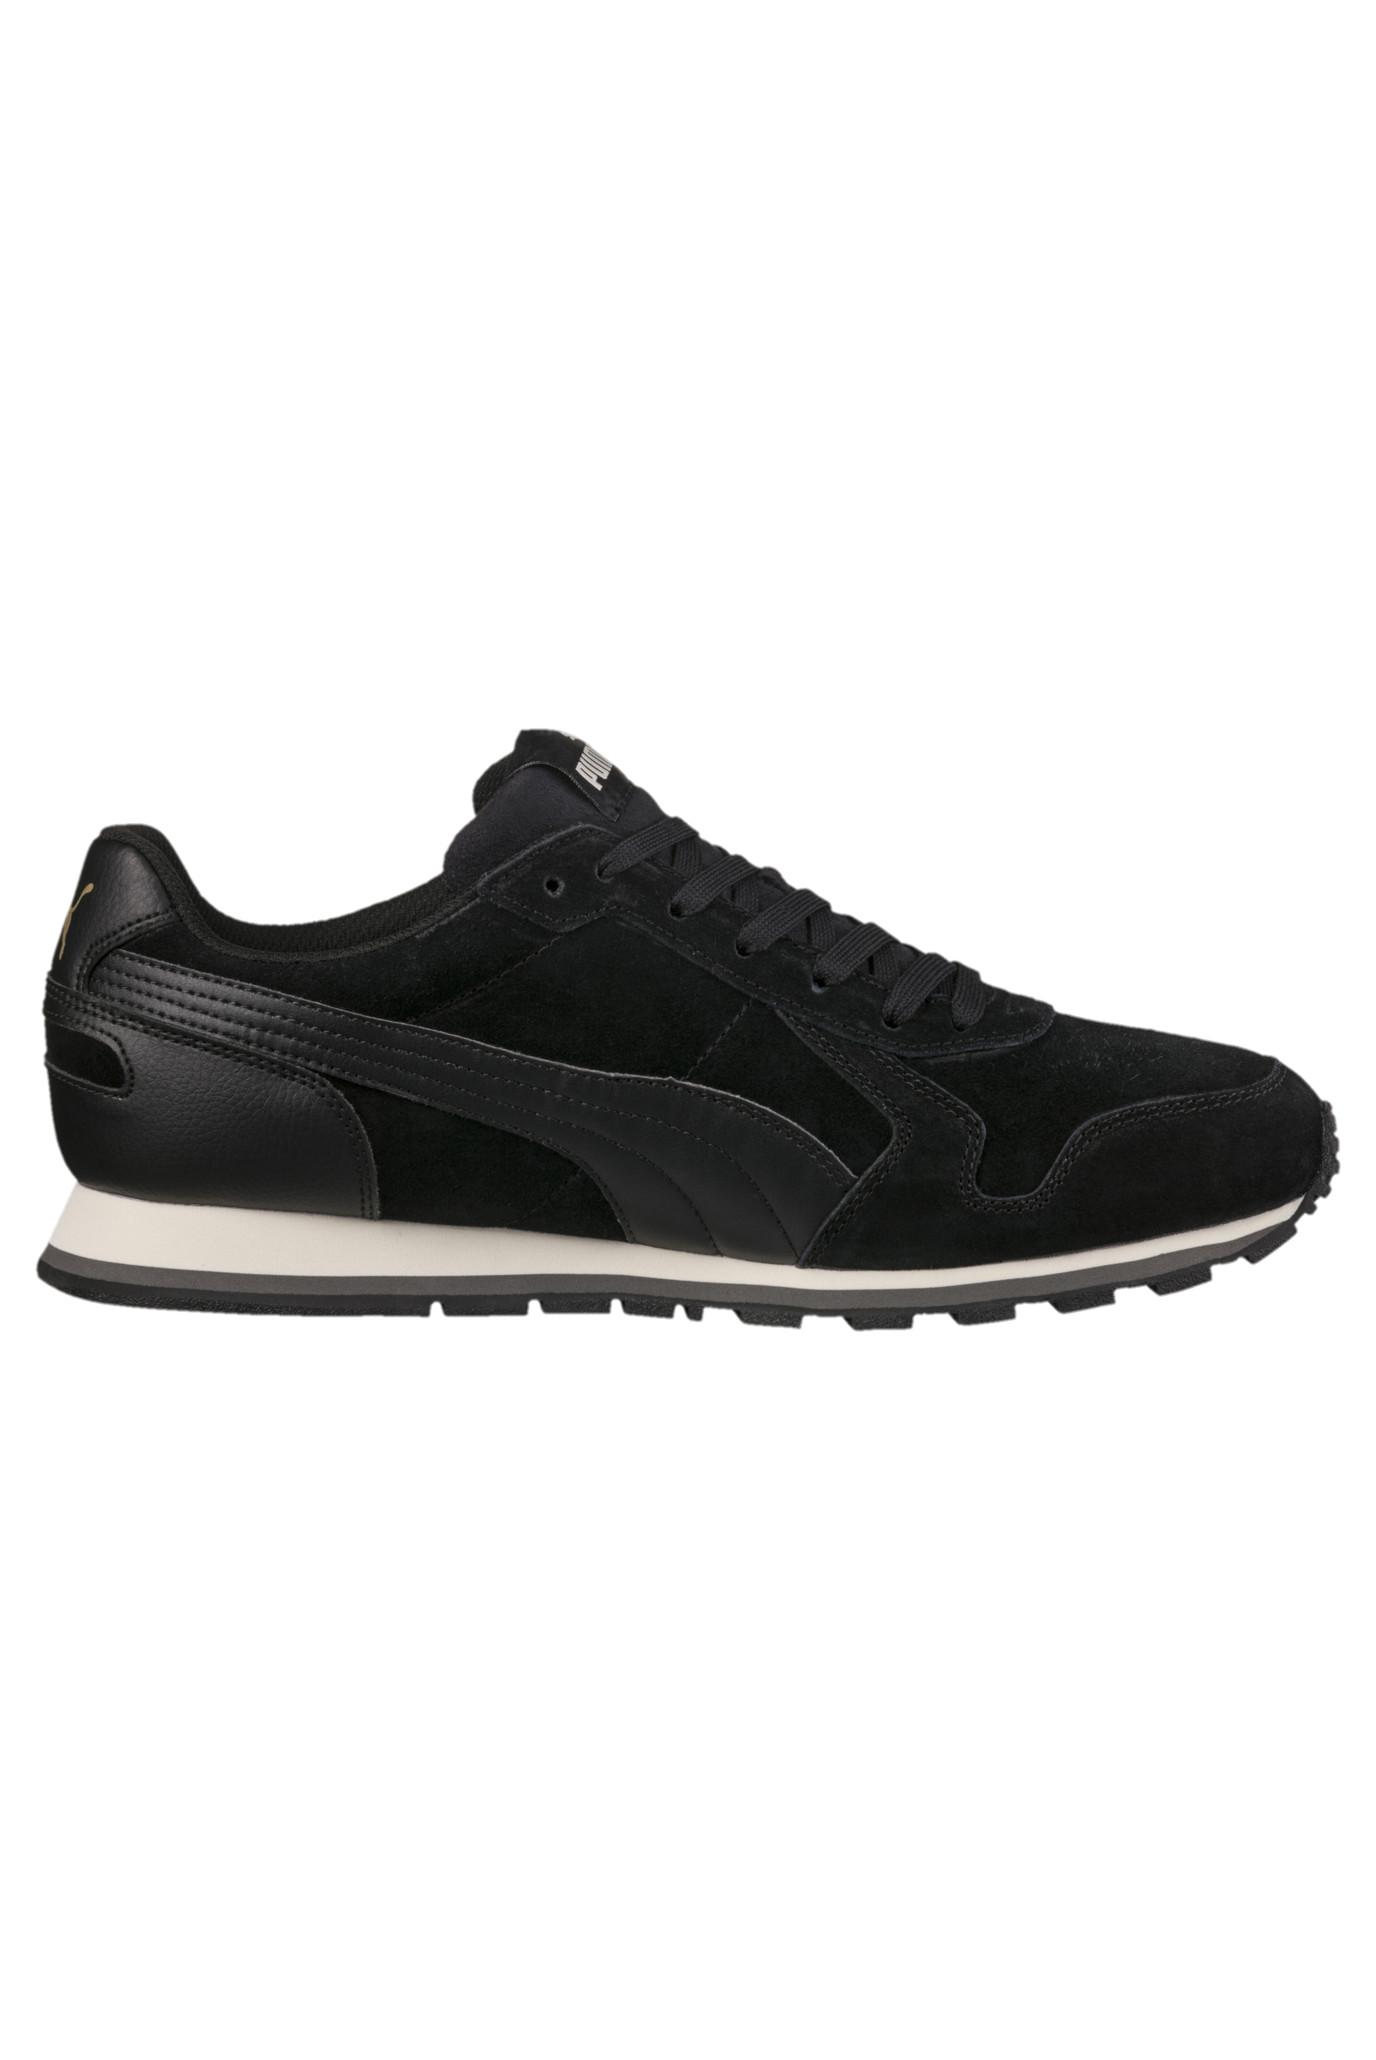 Жіночі чорні кросівки ST Runner SD 1